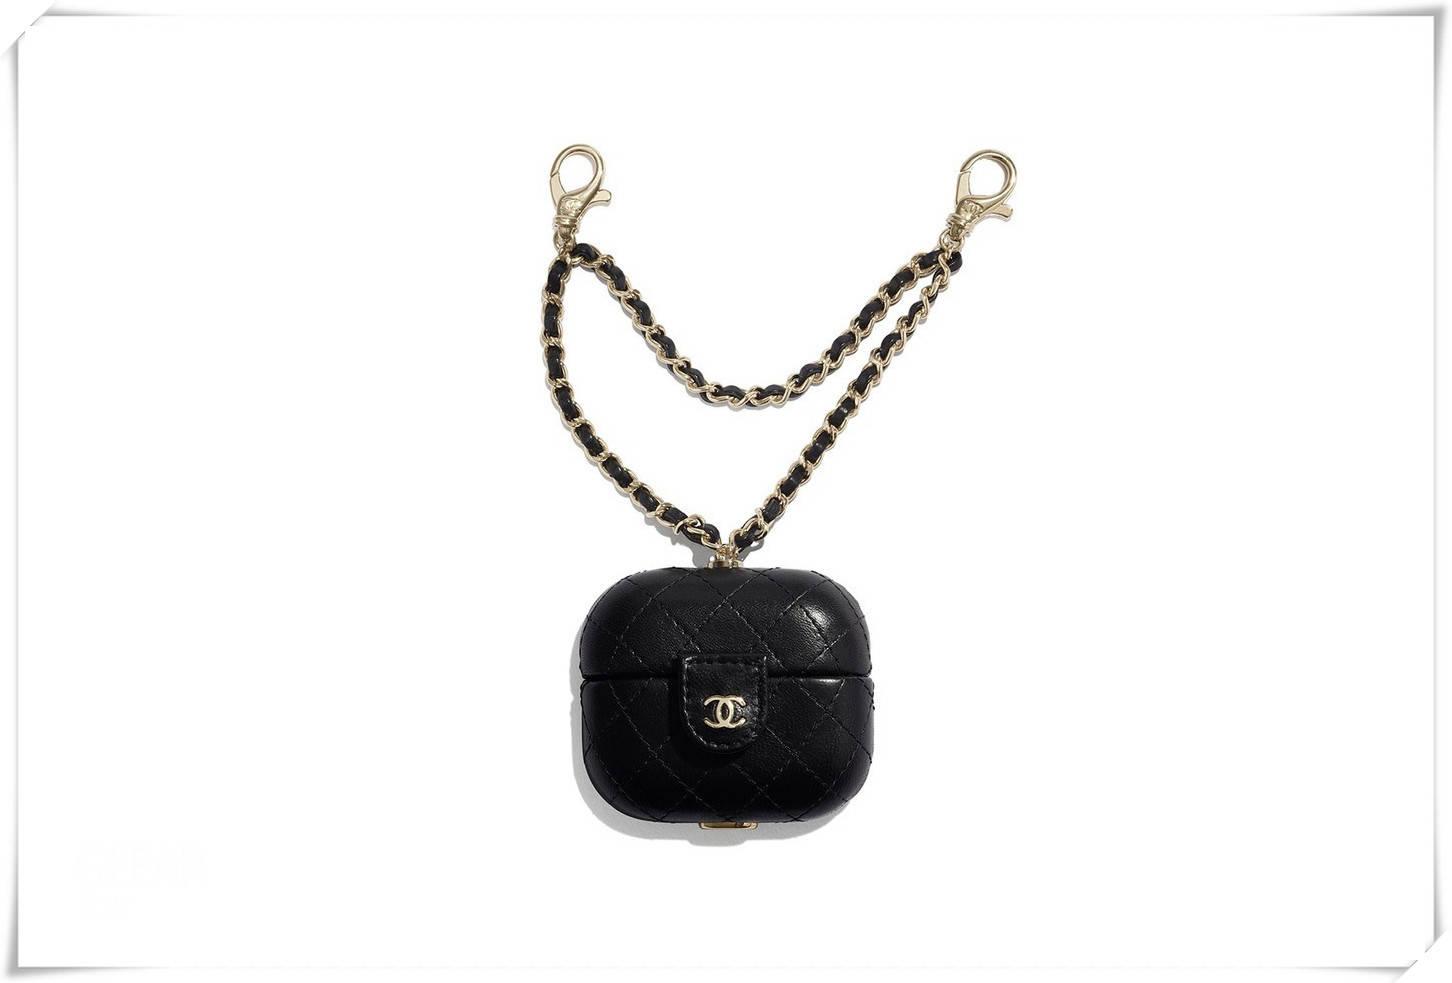 Chanel新款小件皮包,负担得起的高级感!